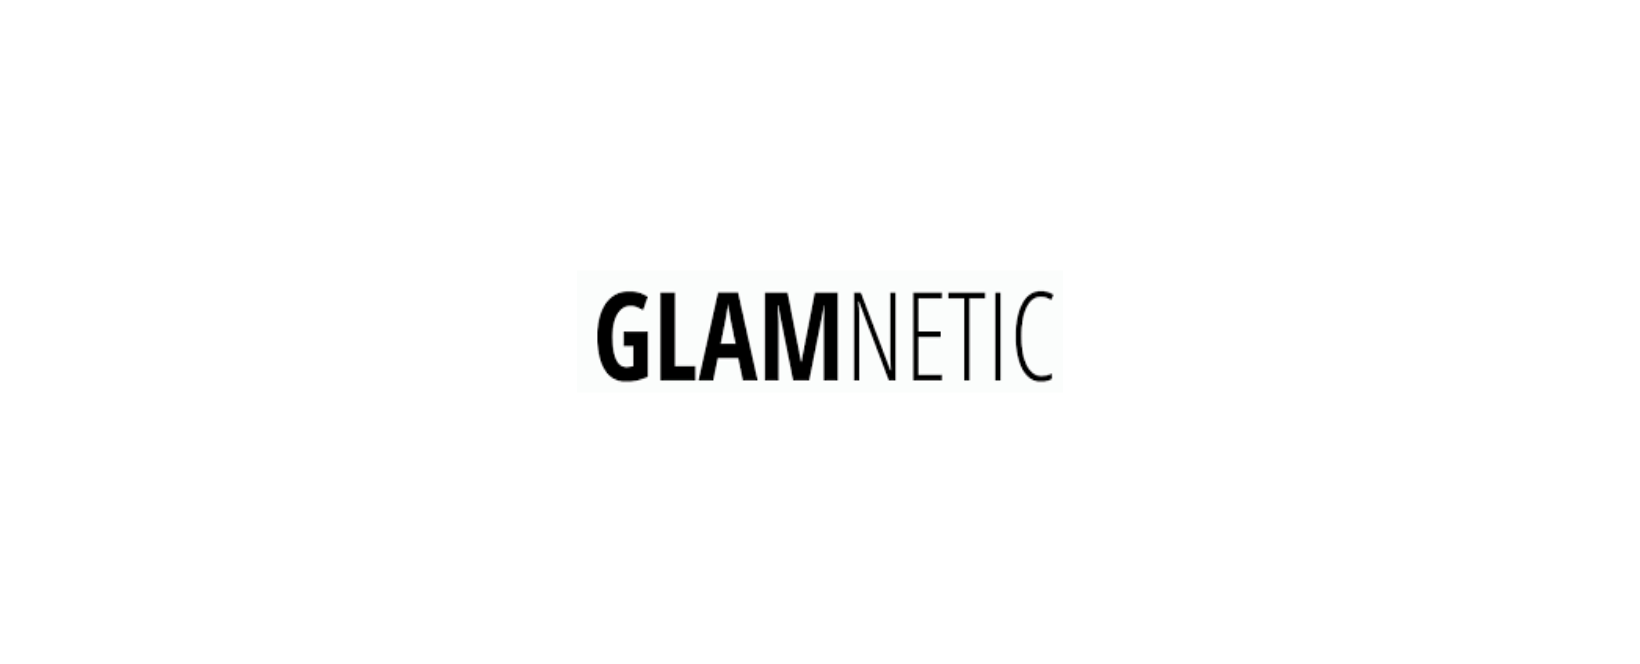 Glamnetic Discount Code 2021